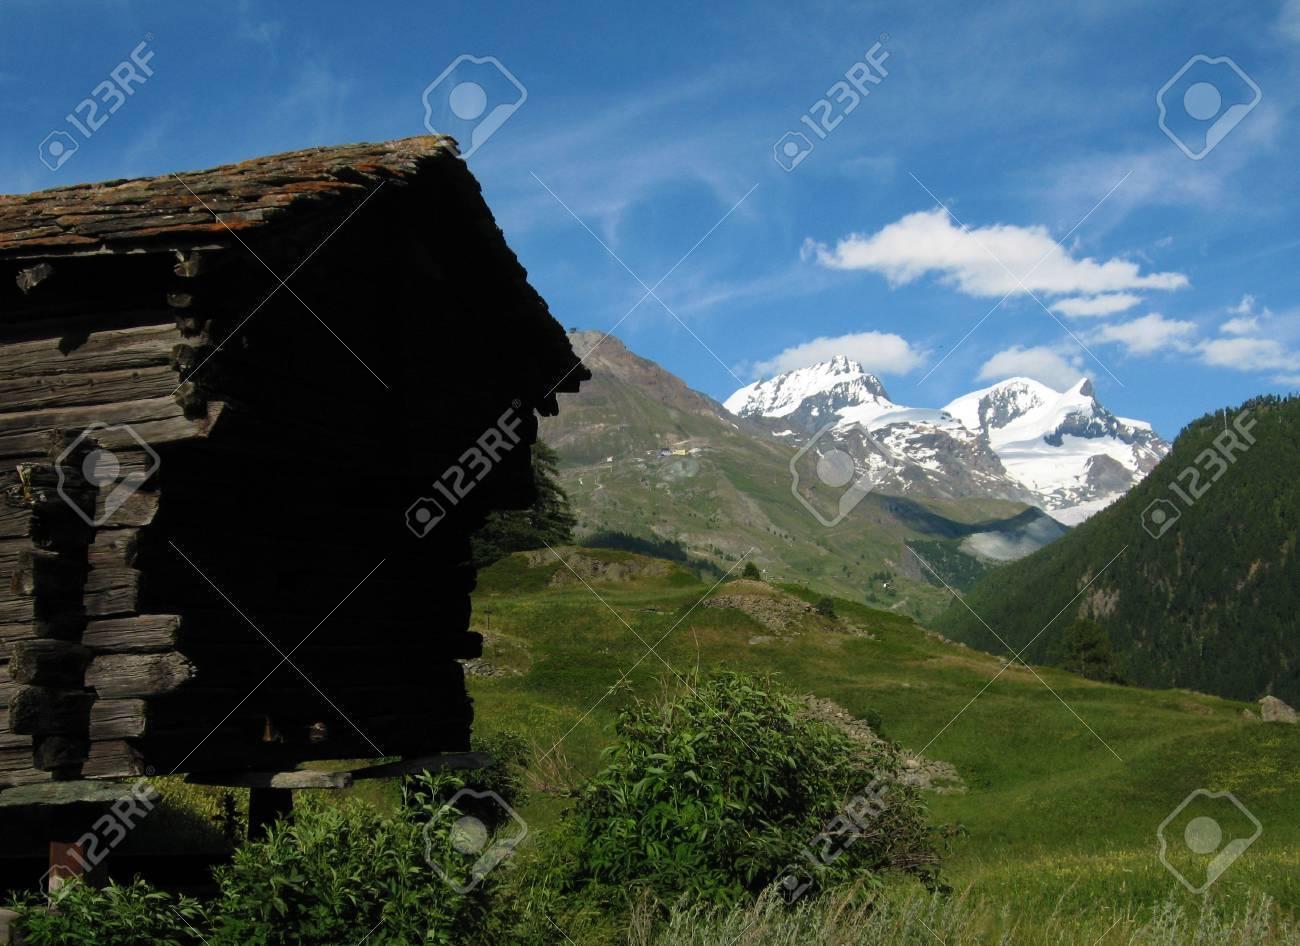 Wooden Hut and Alps Meadows, Zermatt, Switzerland Stock Photo - 14396071